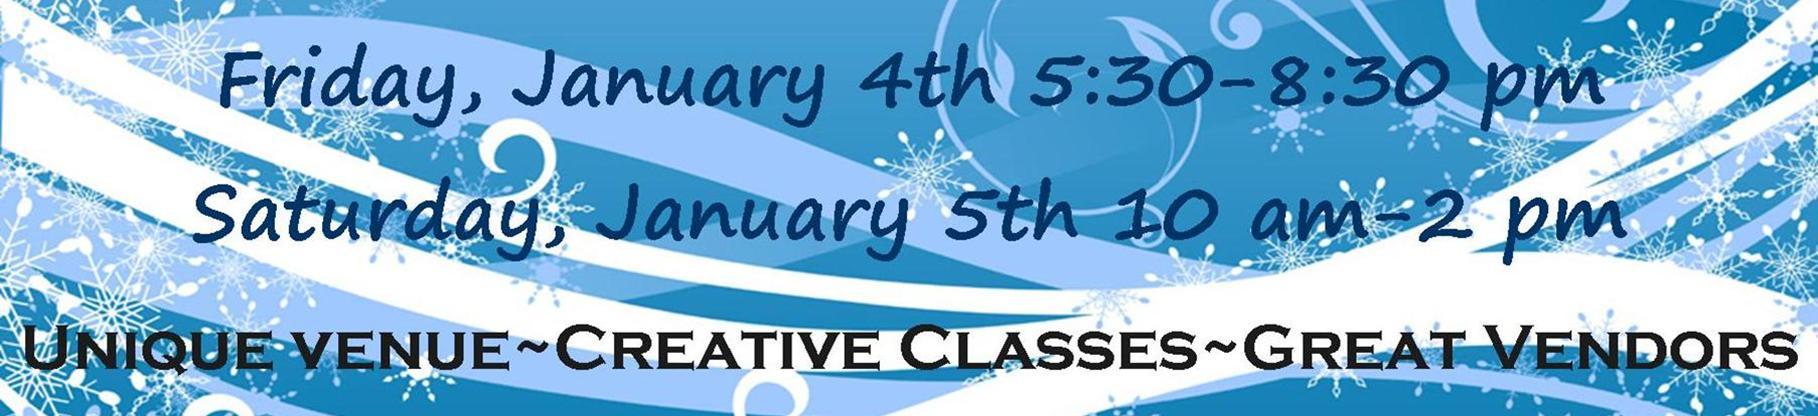 January 4-5